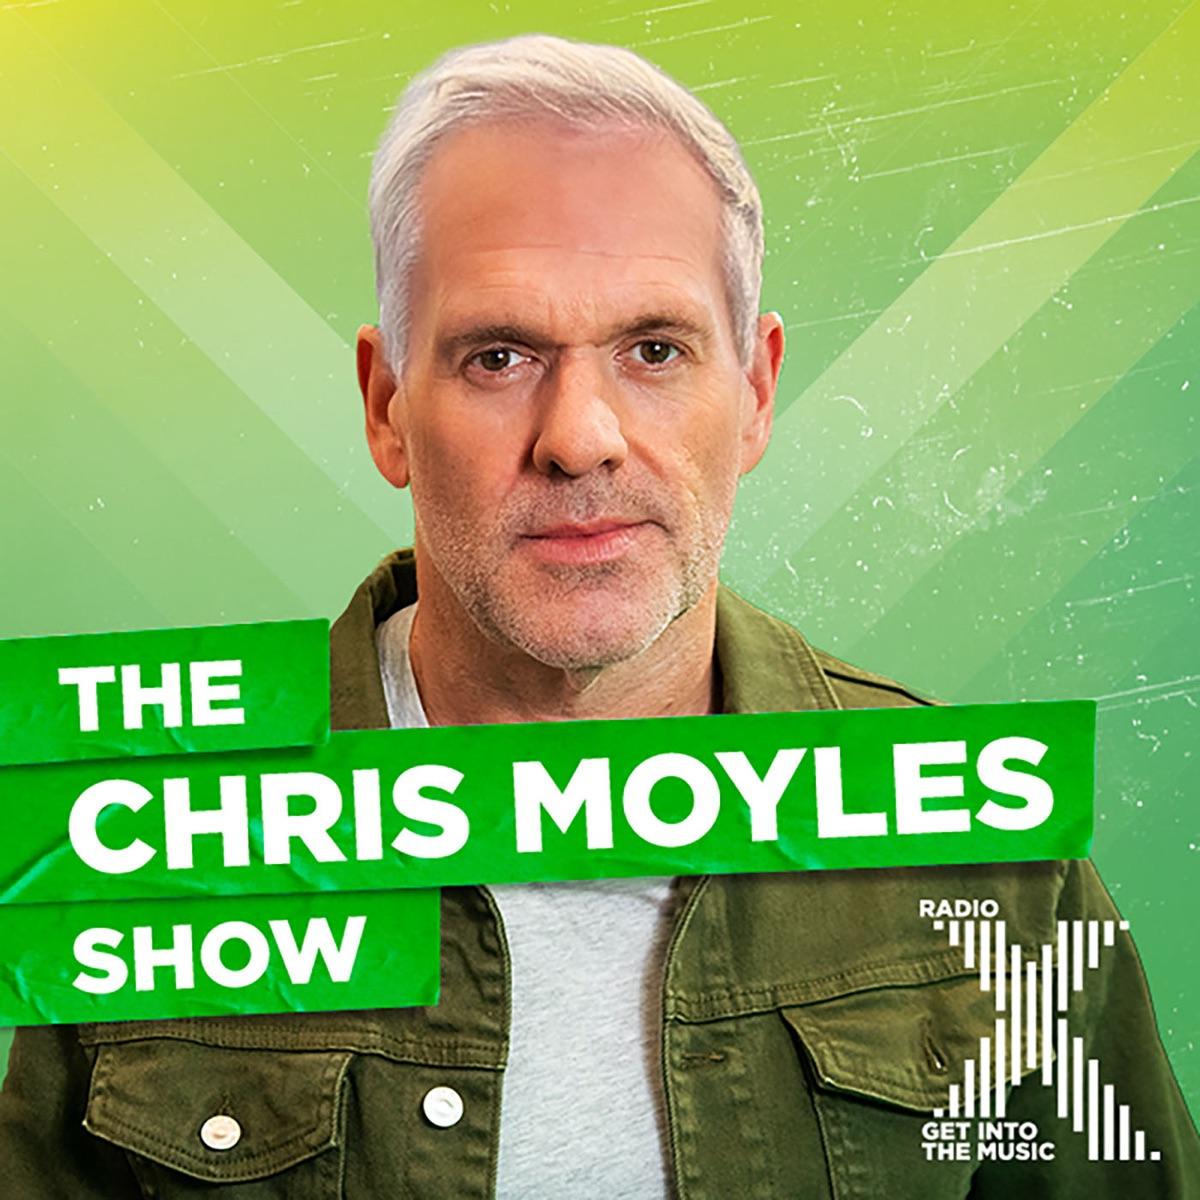 The Chris Moyles Show on Radio X Podcast